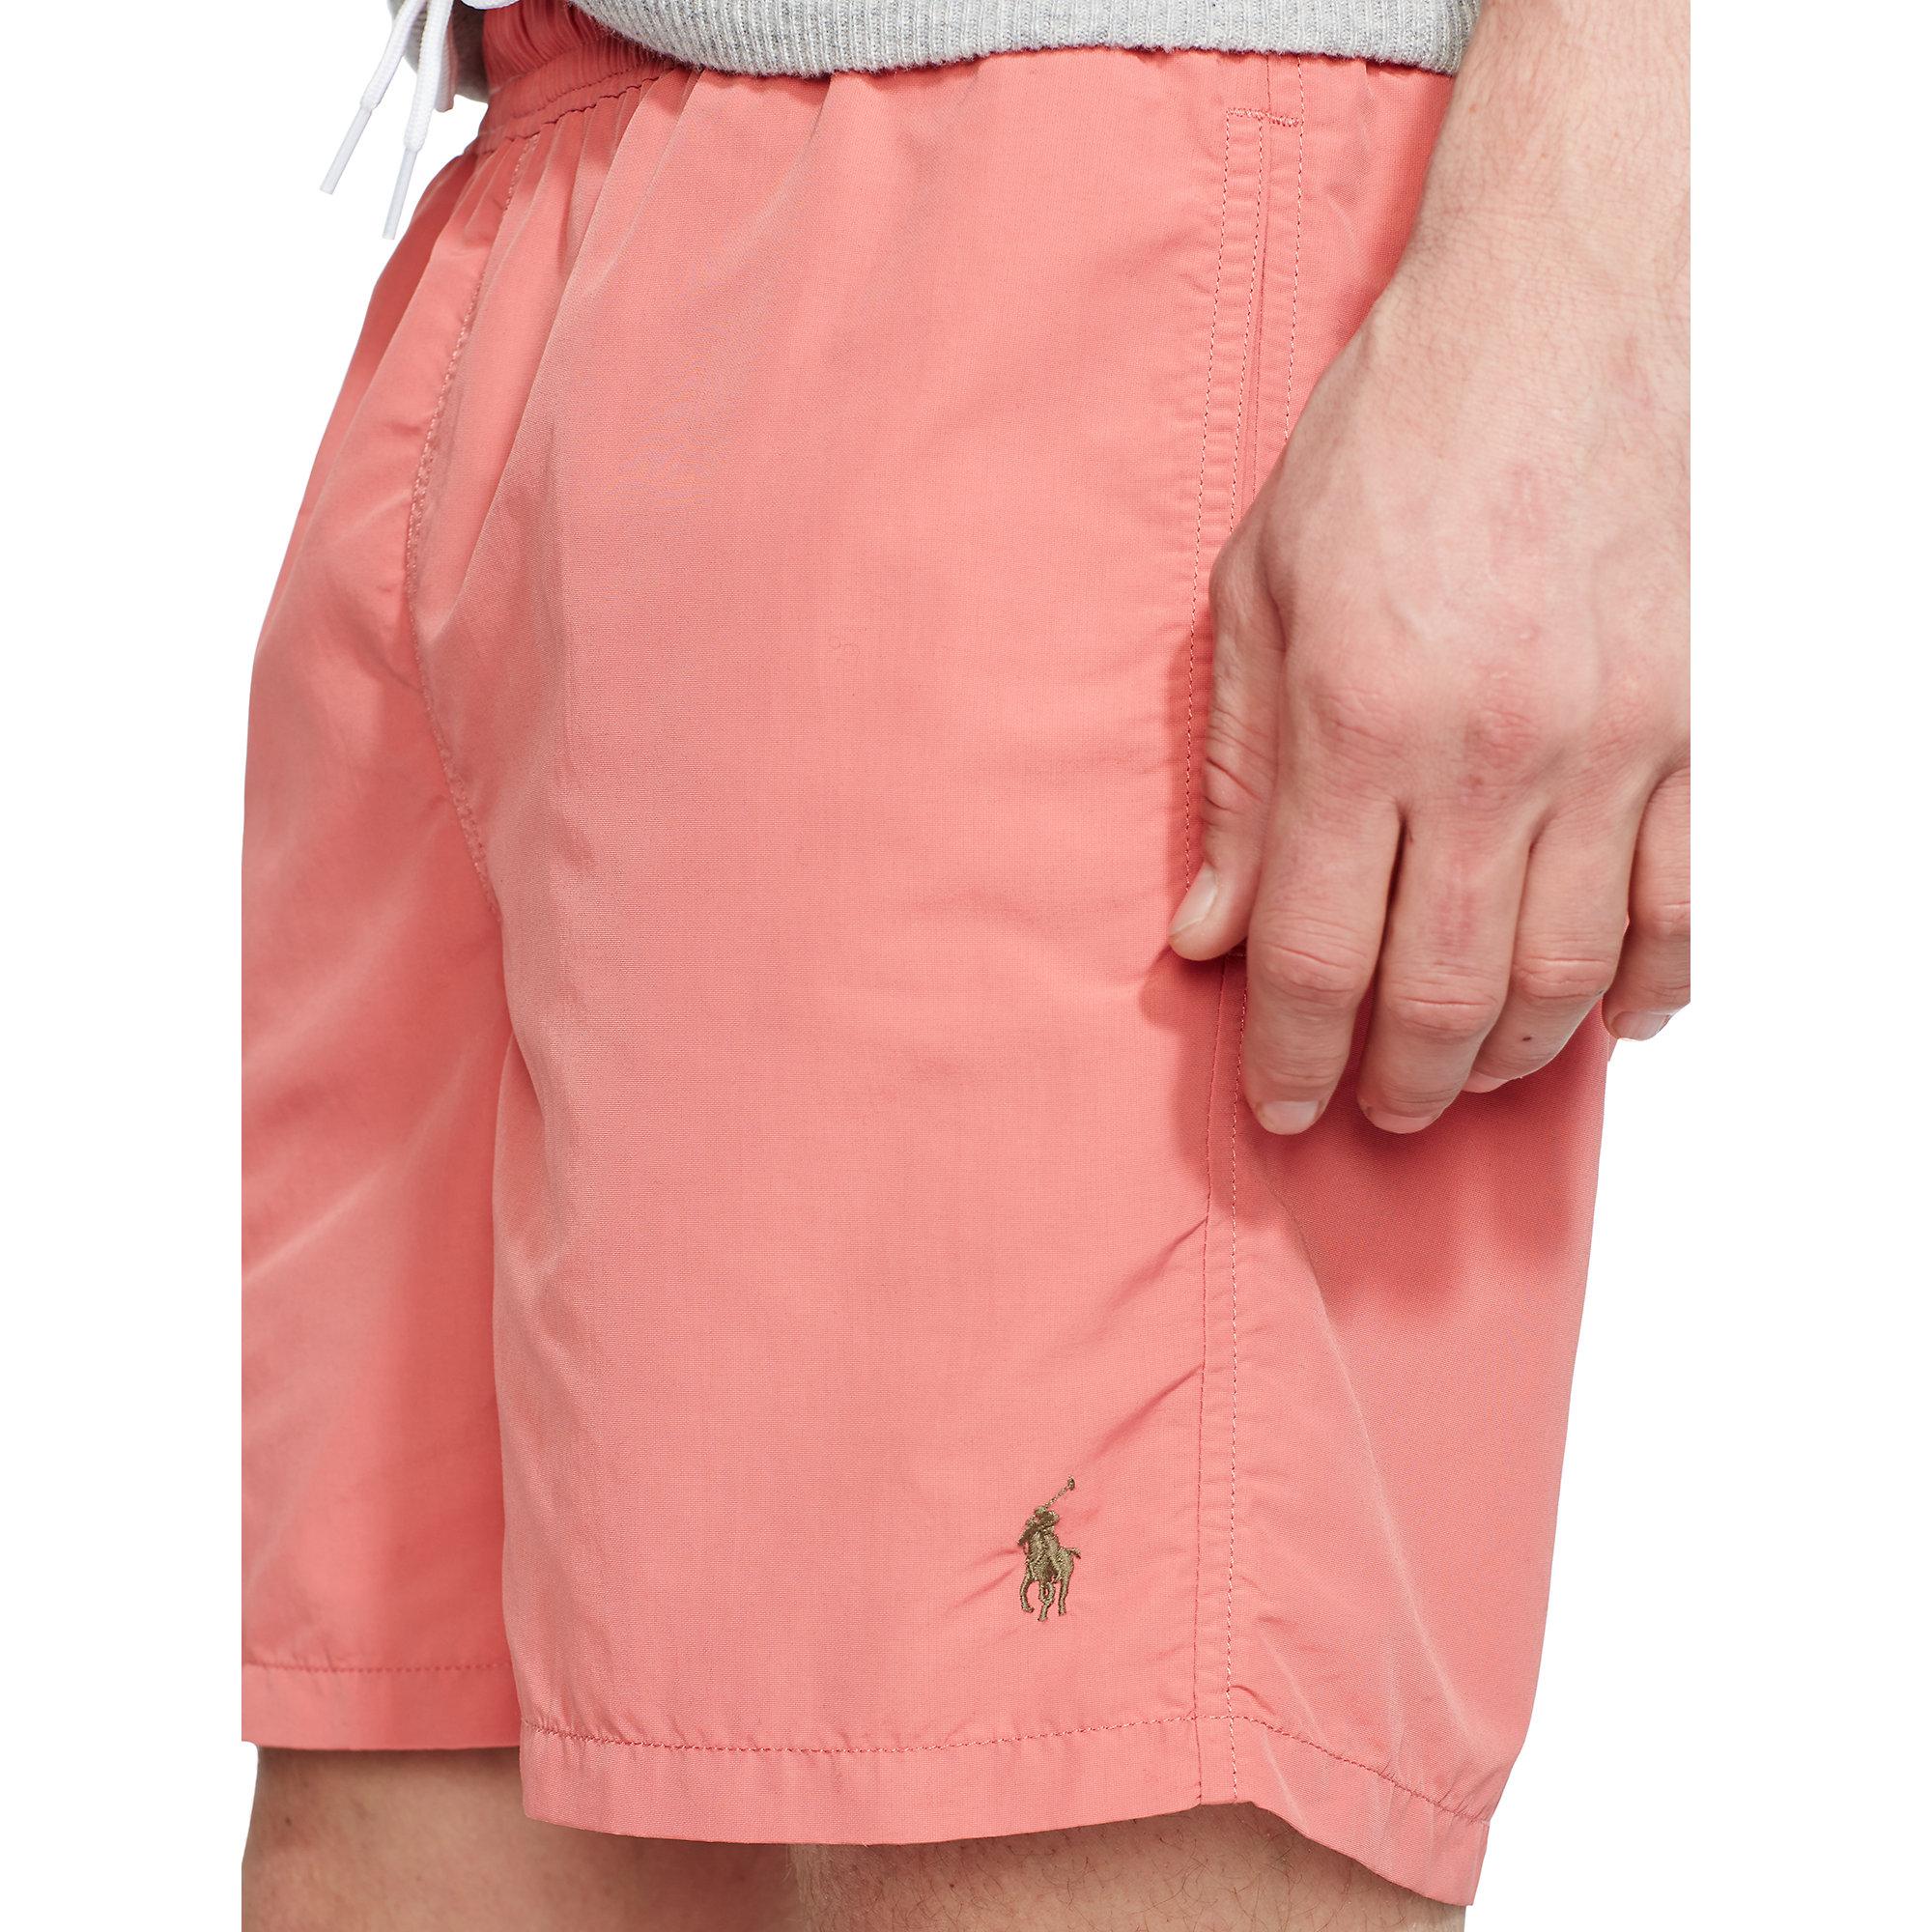 773ae3e8fb ... promo code lyst polo ralph lauren 6 solid hawaiian swim trunk in pink  for men 89510